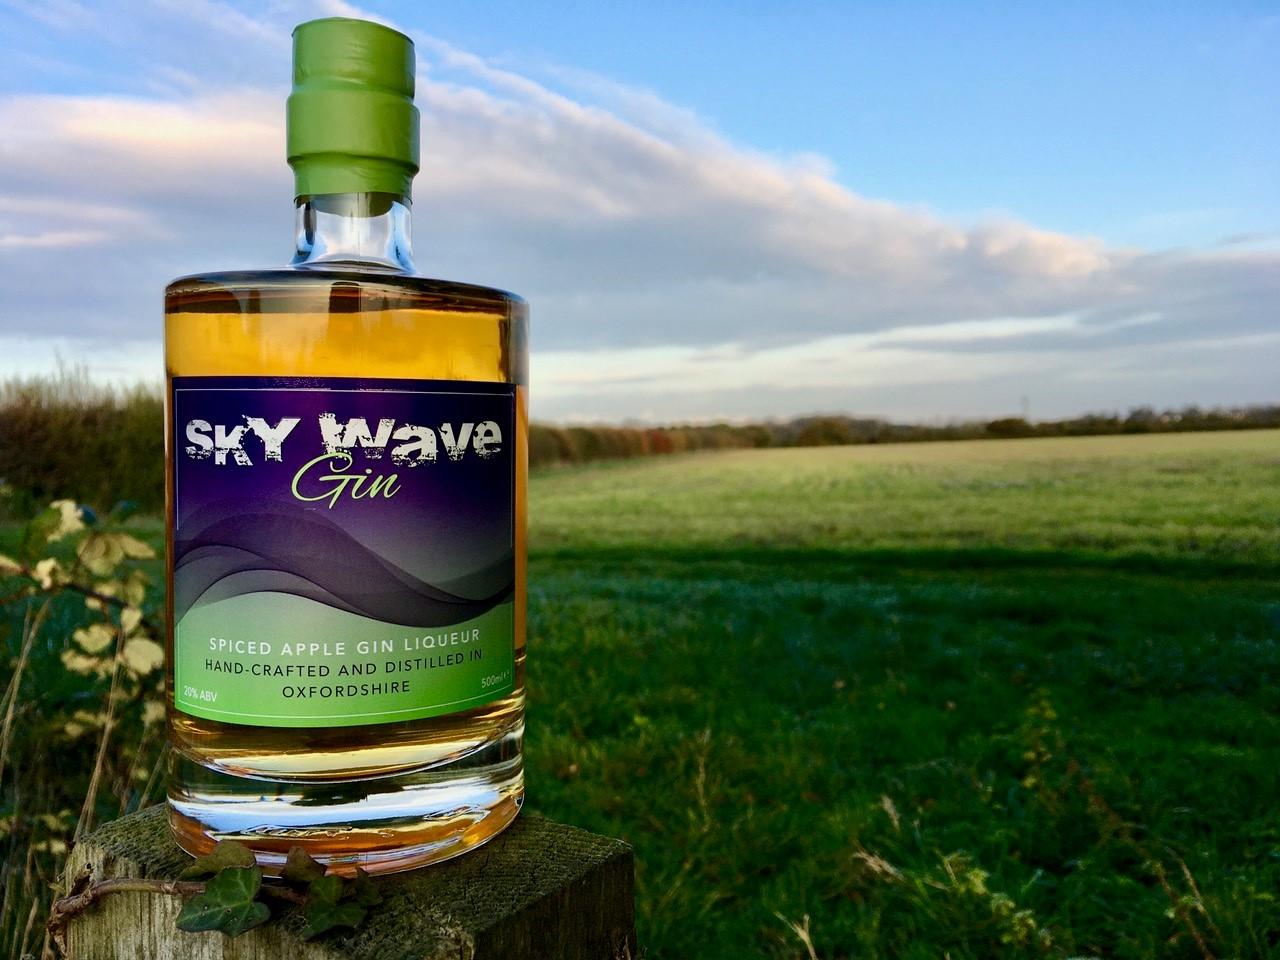 Sky Wave Gin Winter Edition Spiced Apple Gin Liqueur